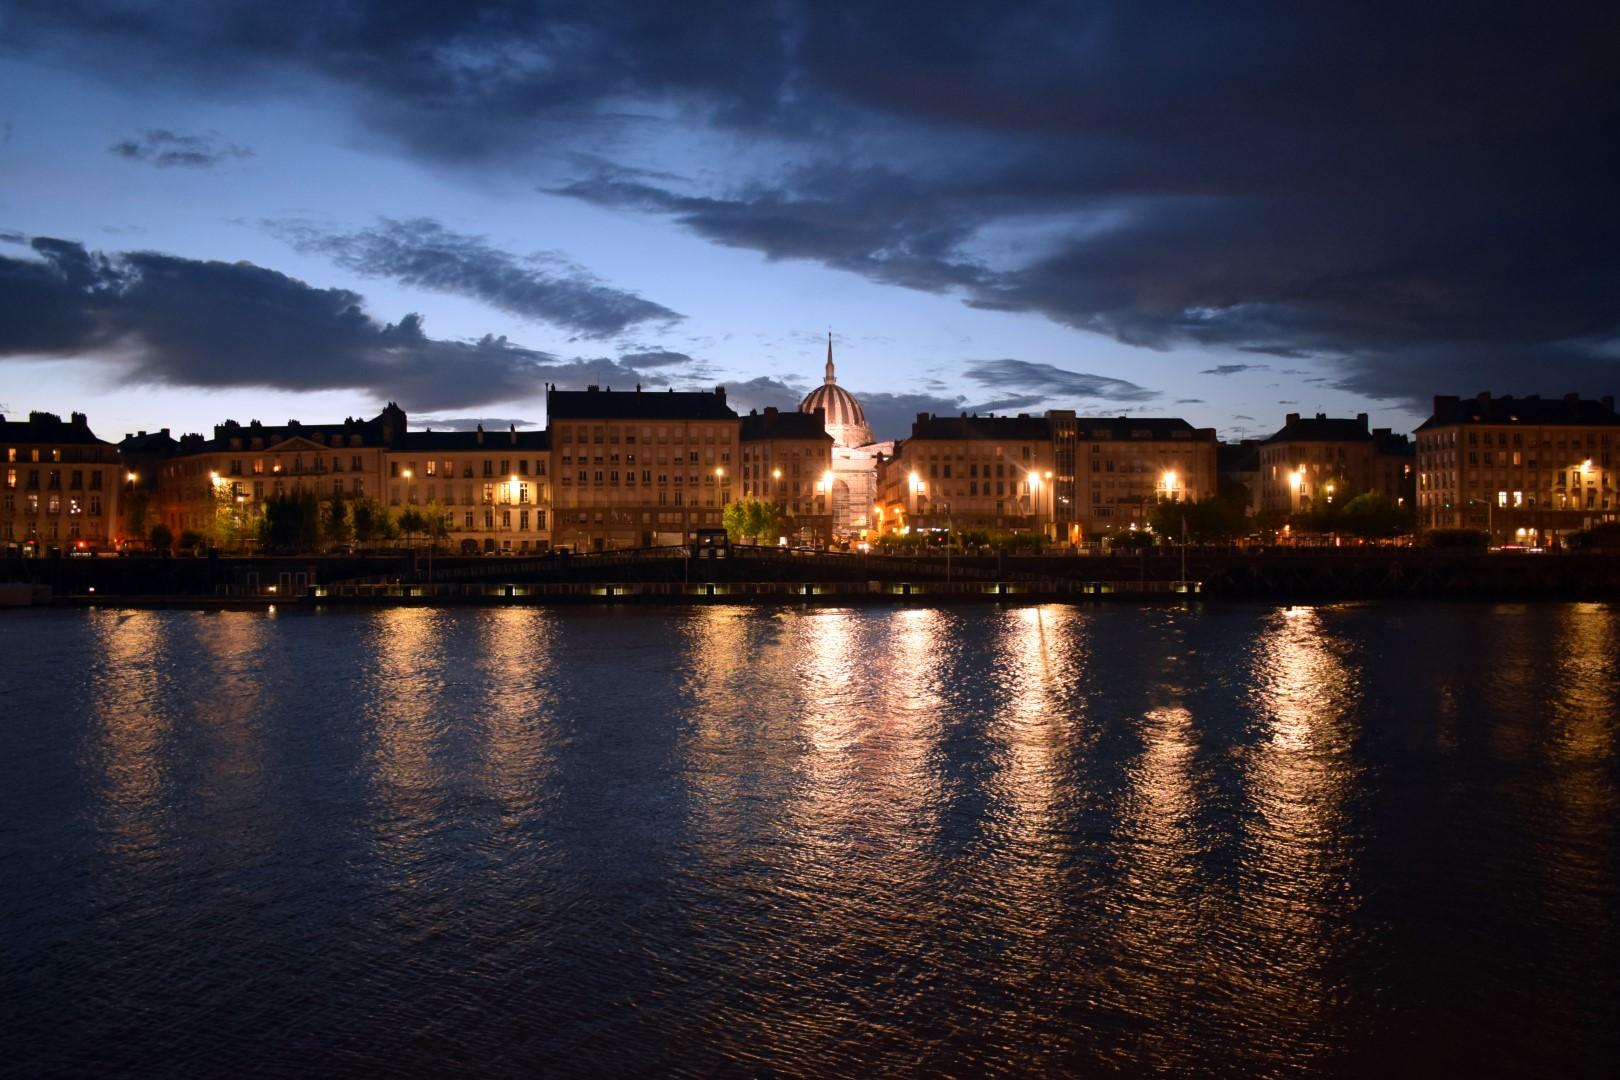 Quai de la Fosse and Loire River, Nantes